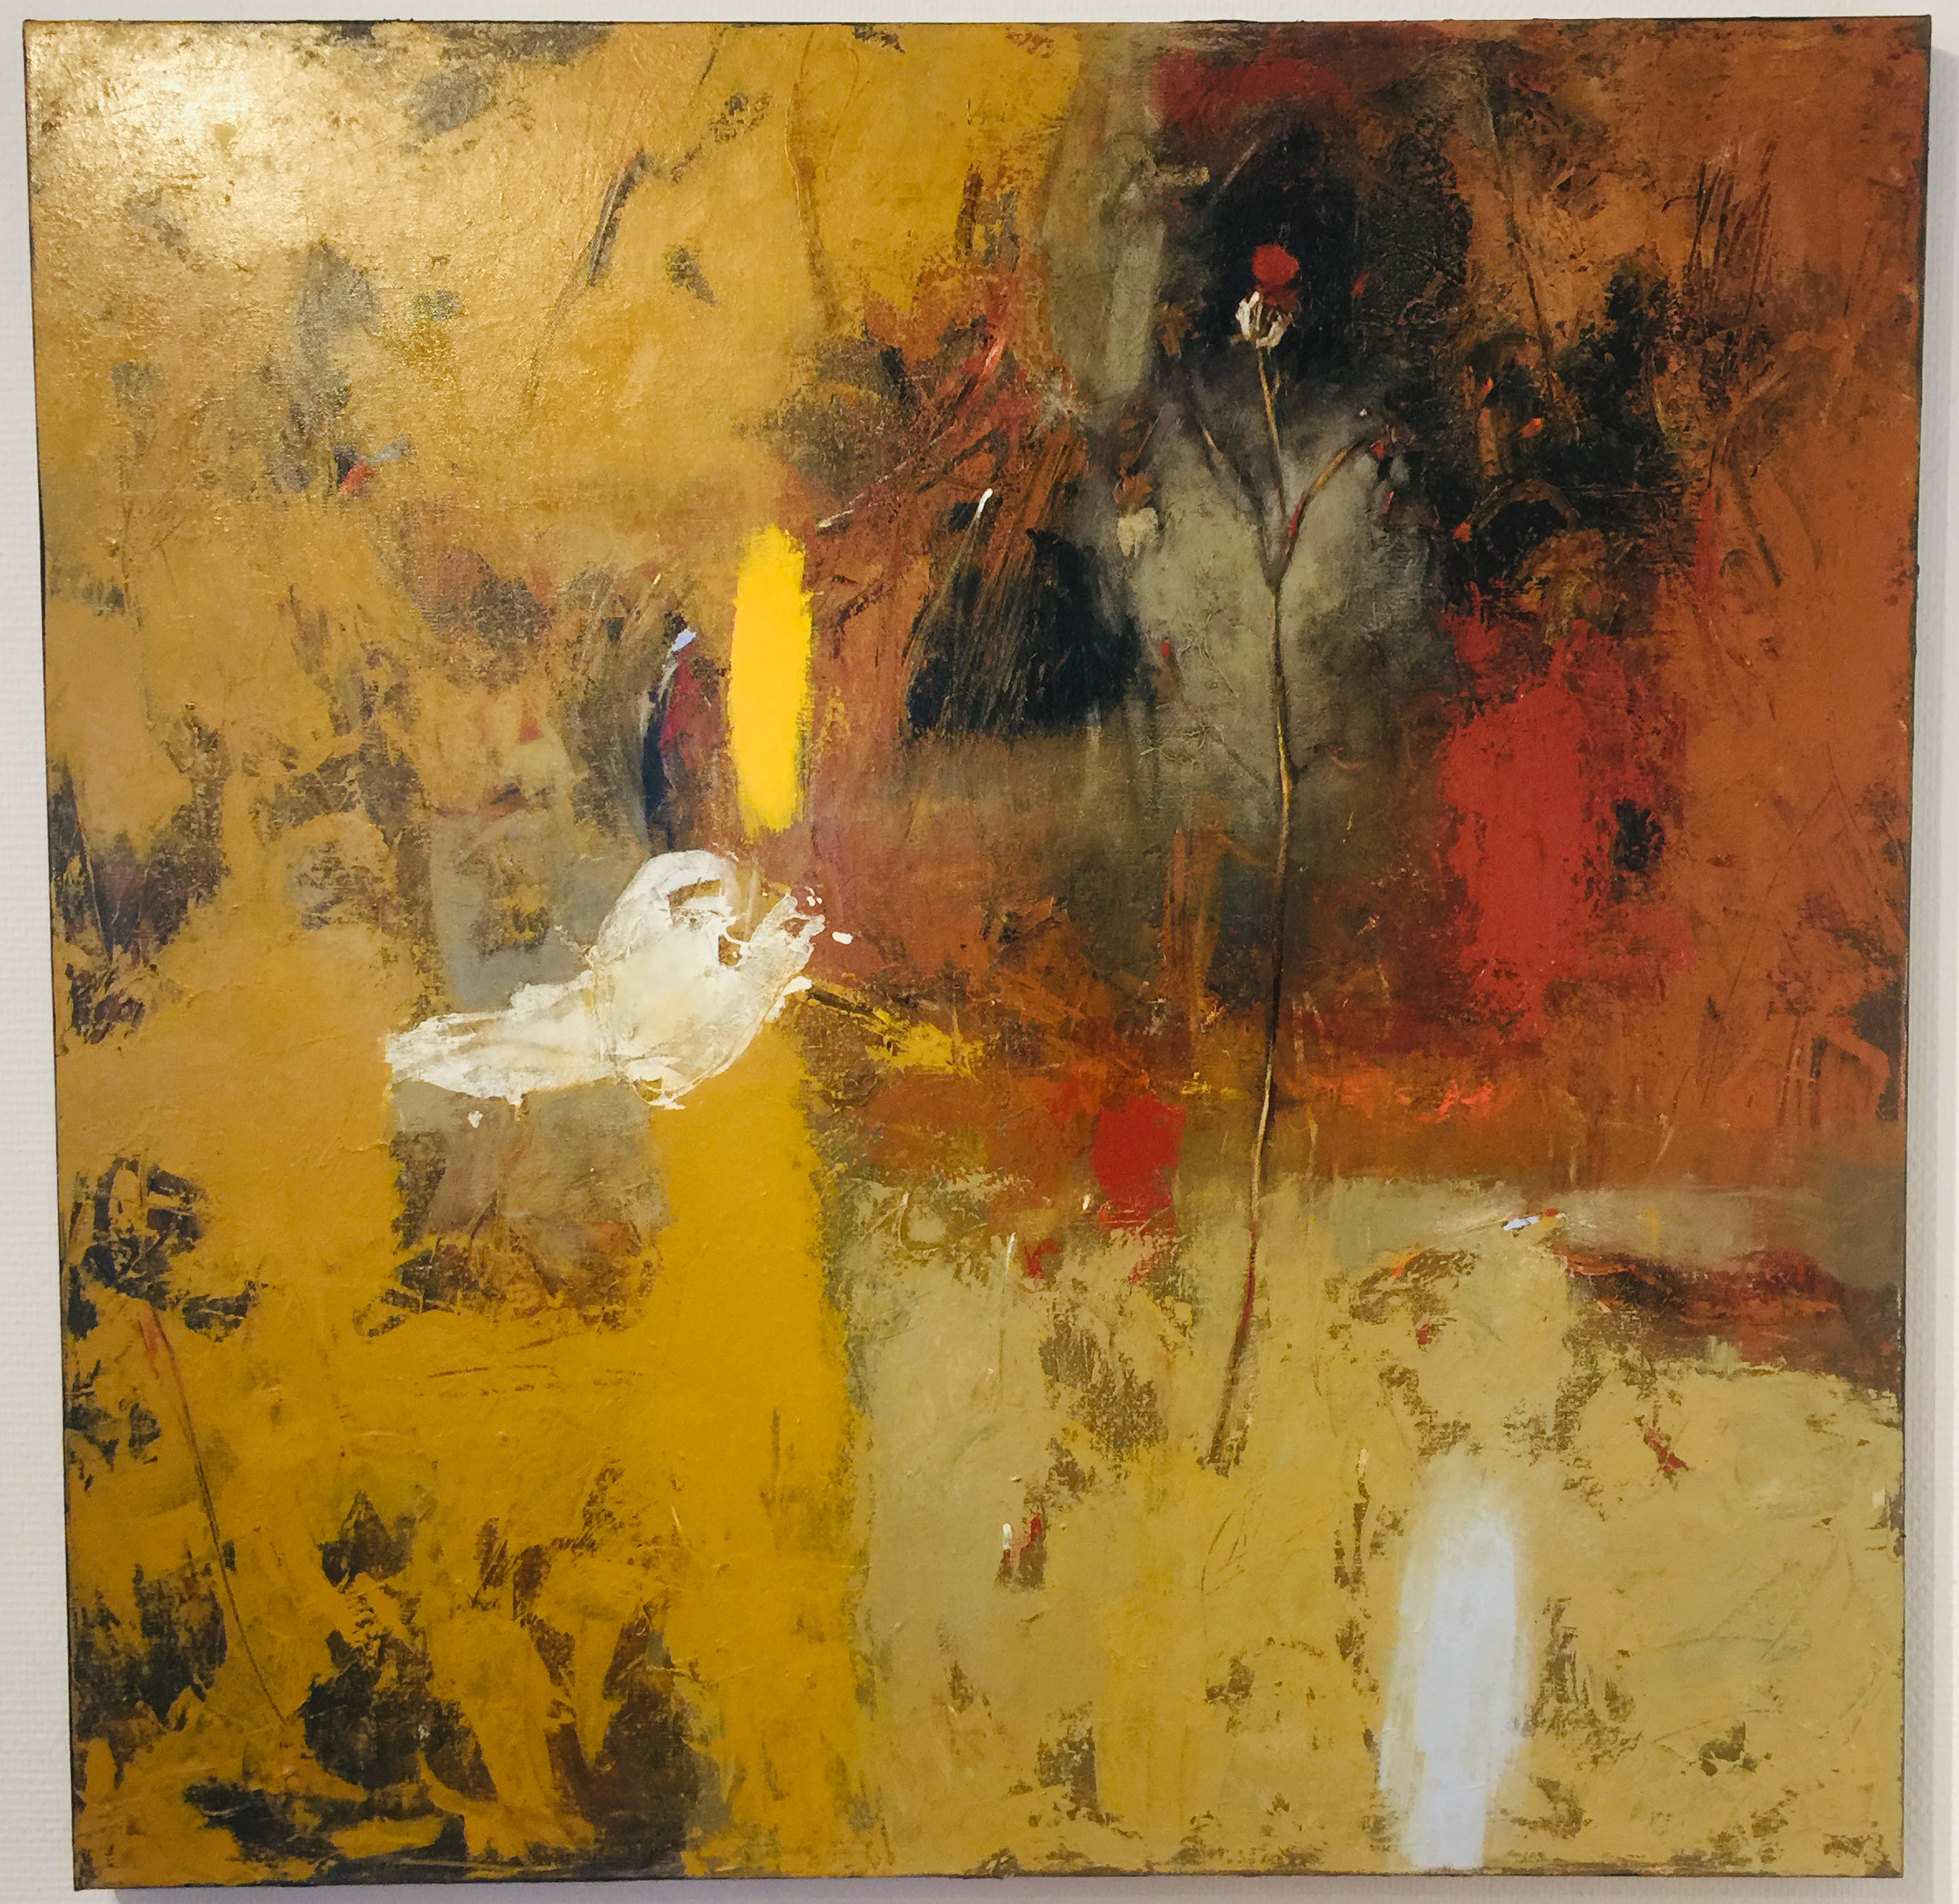 Oleg Bondarenko-Secret dance of Nature III, oil painting